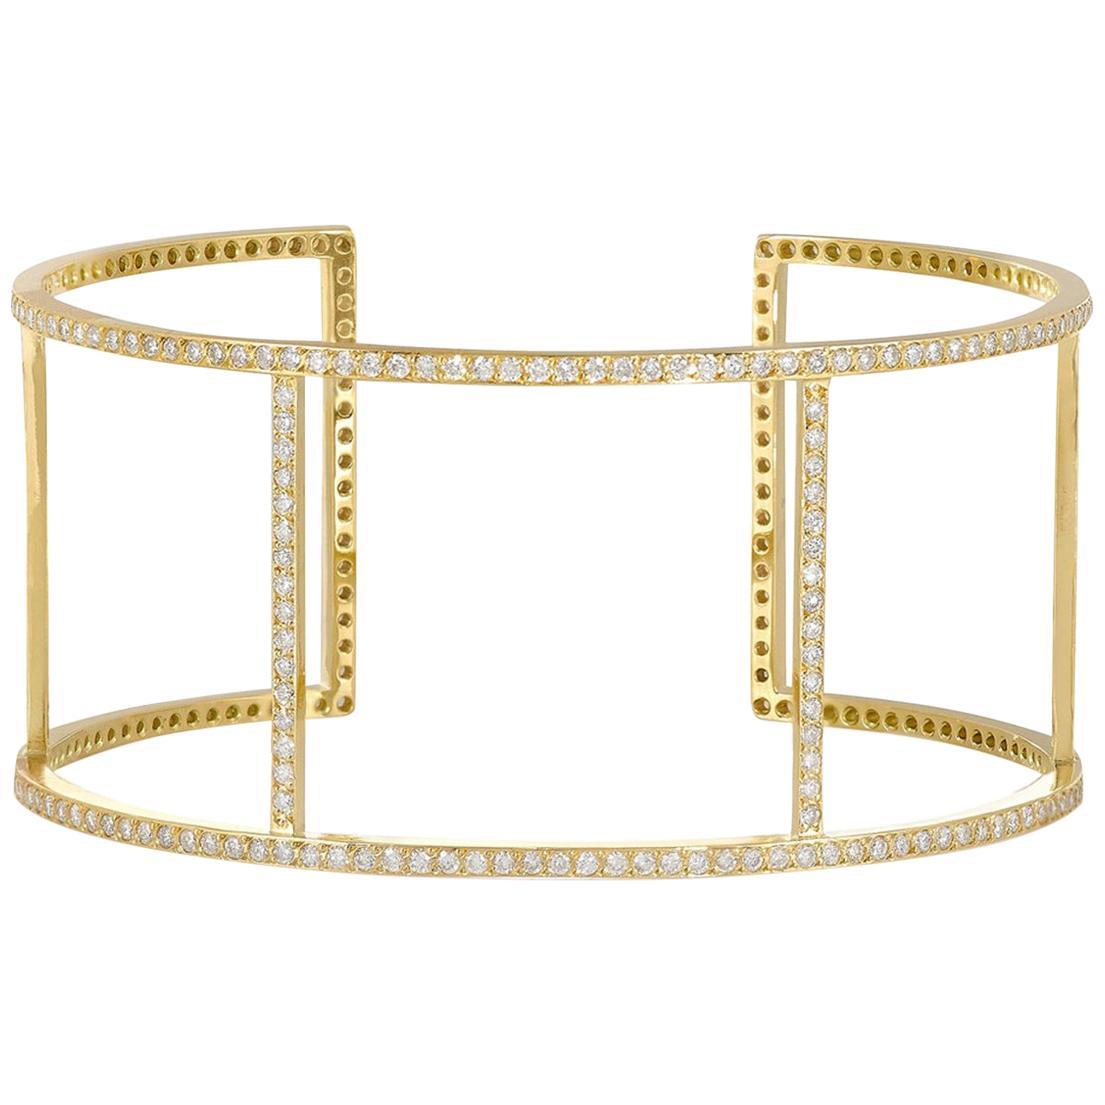 Ileana Makri 18 Karat Yellow Gold Pavé White Diamond Wire Cuff